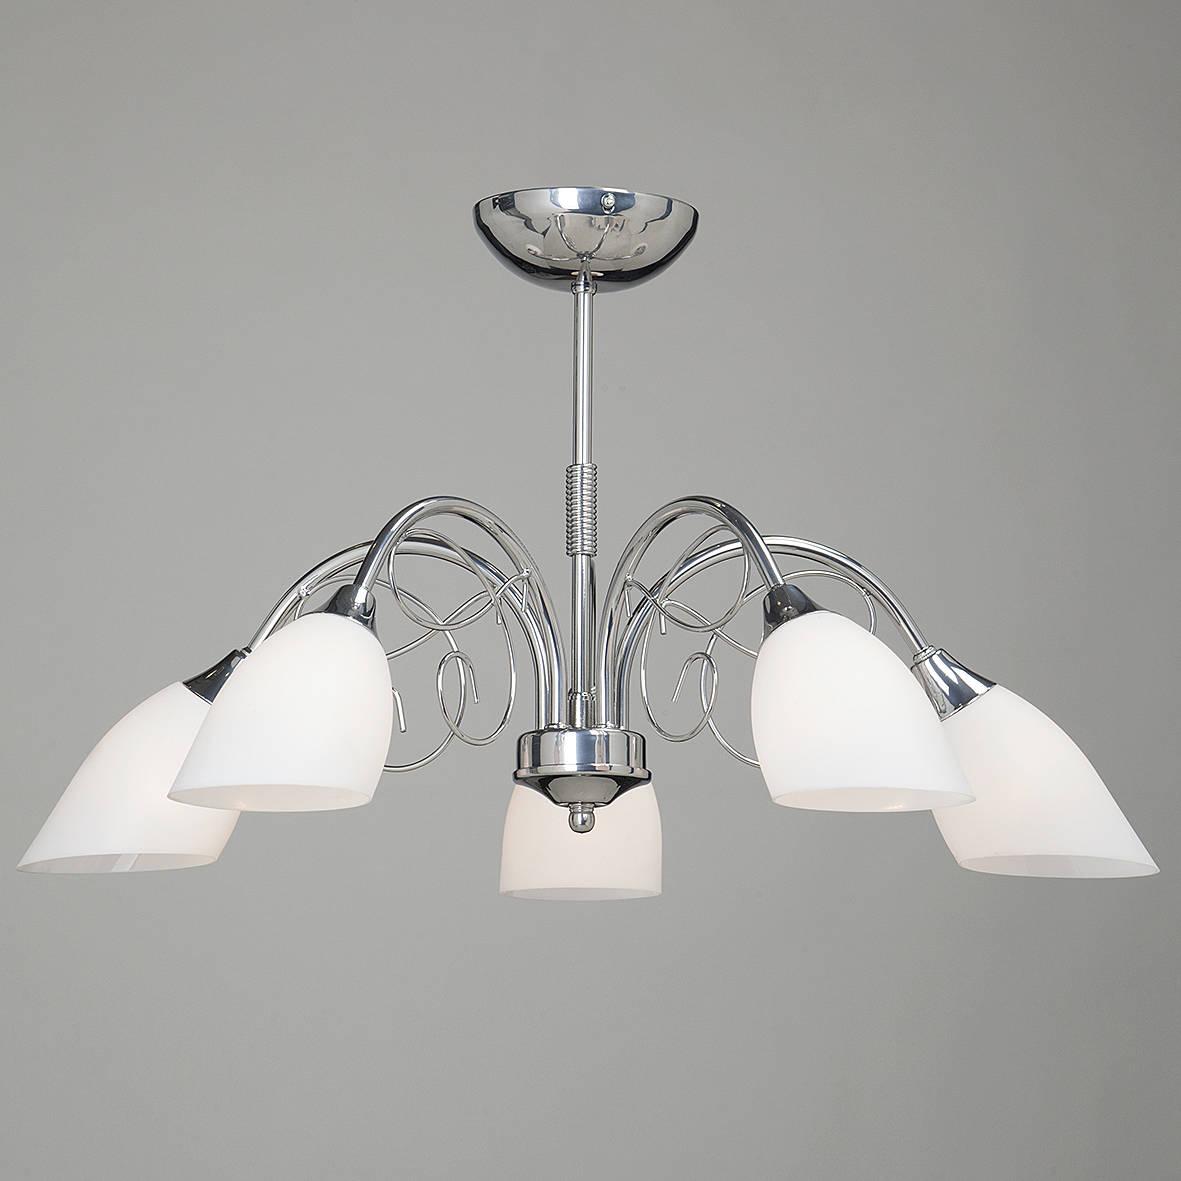 Люстра Vitaluce V3580/5pl люстра v1453 5pl 5х60вт е14 металл стекло vitaluce